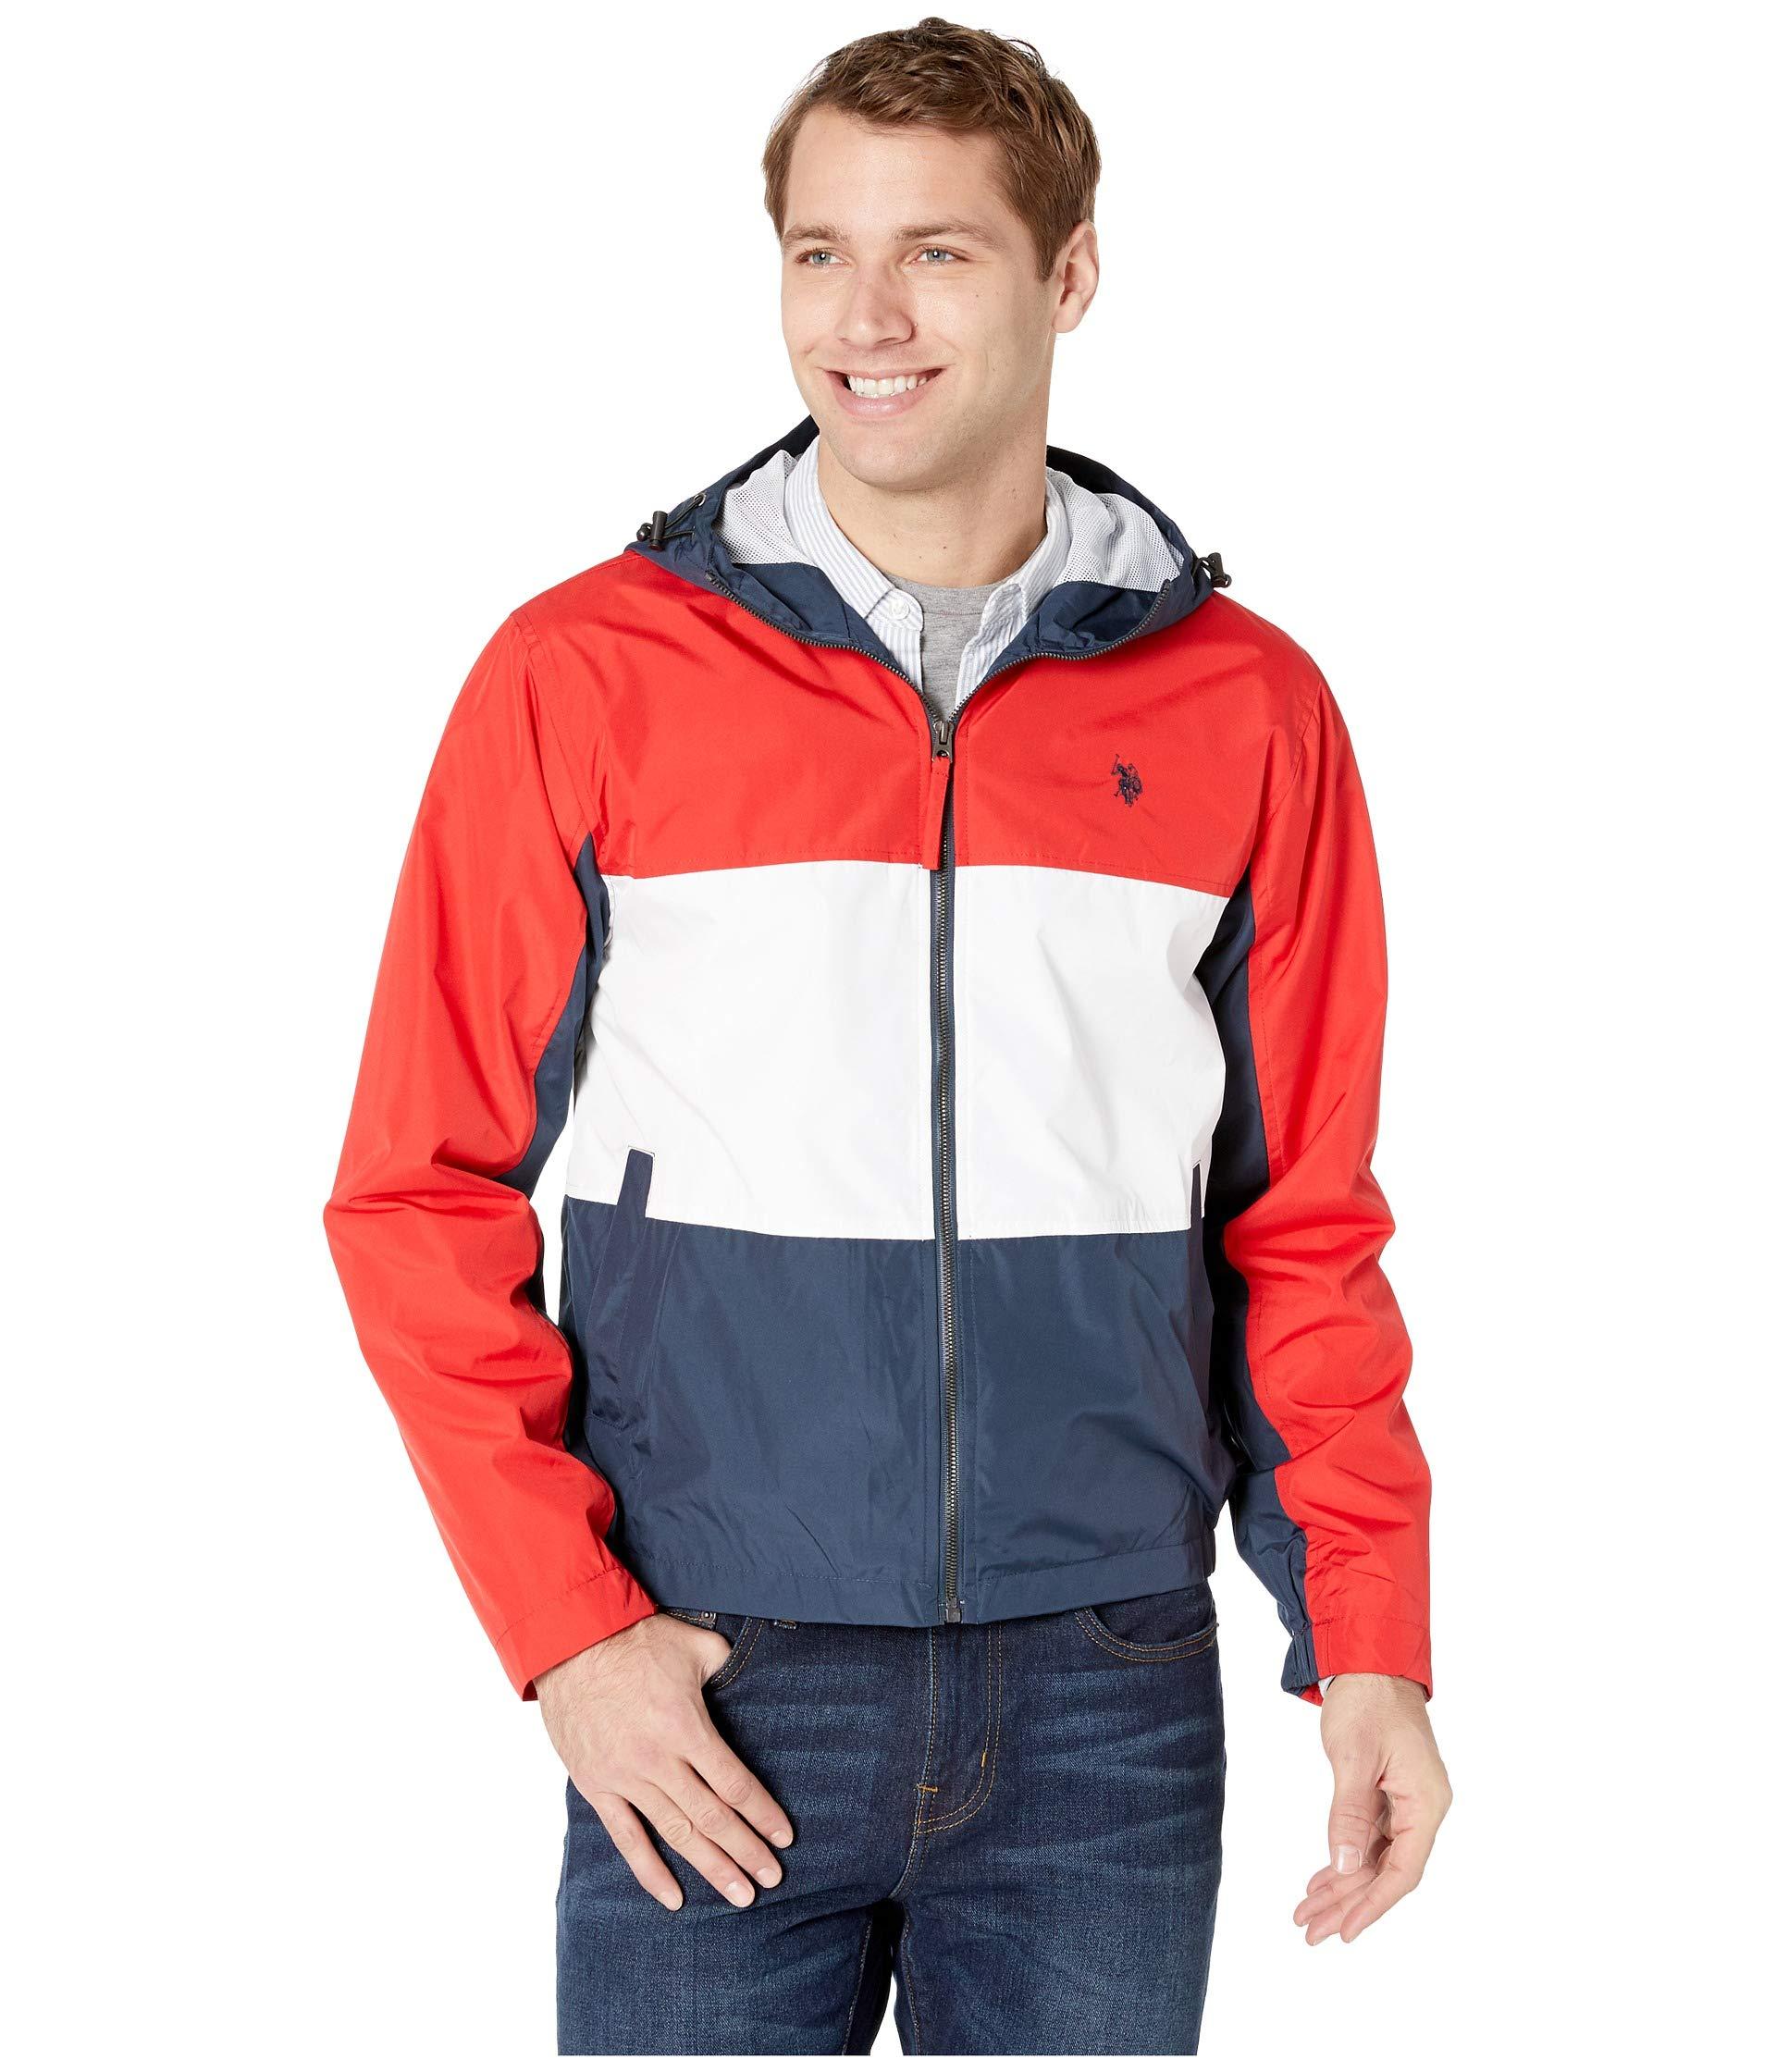 Polo Assn U.S Mens Tri Color Windbreaker Jacket